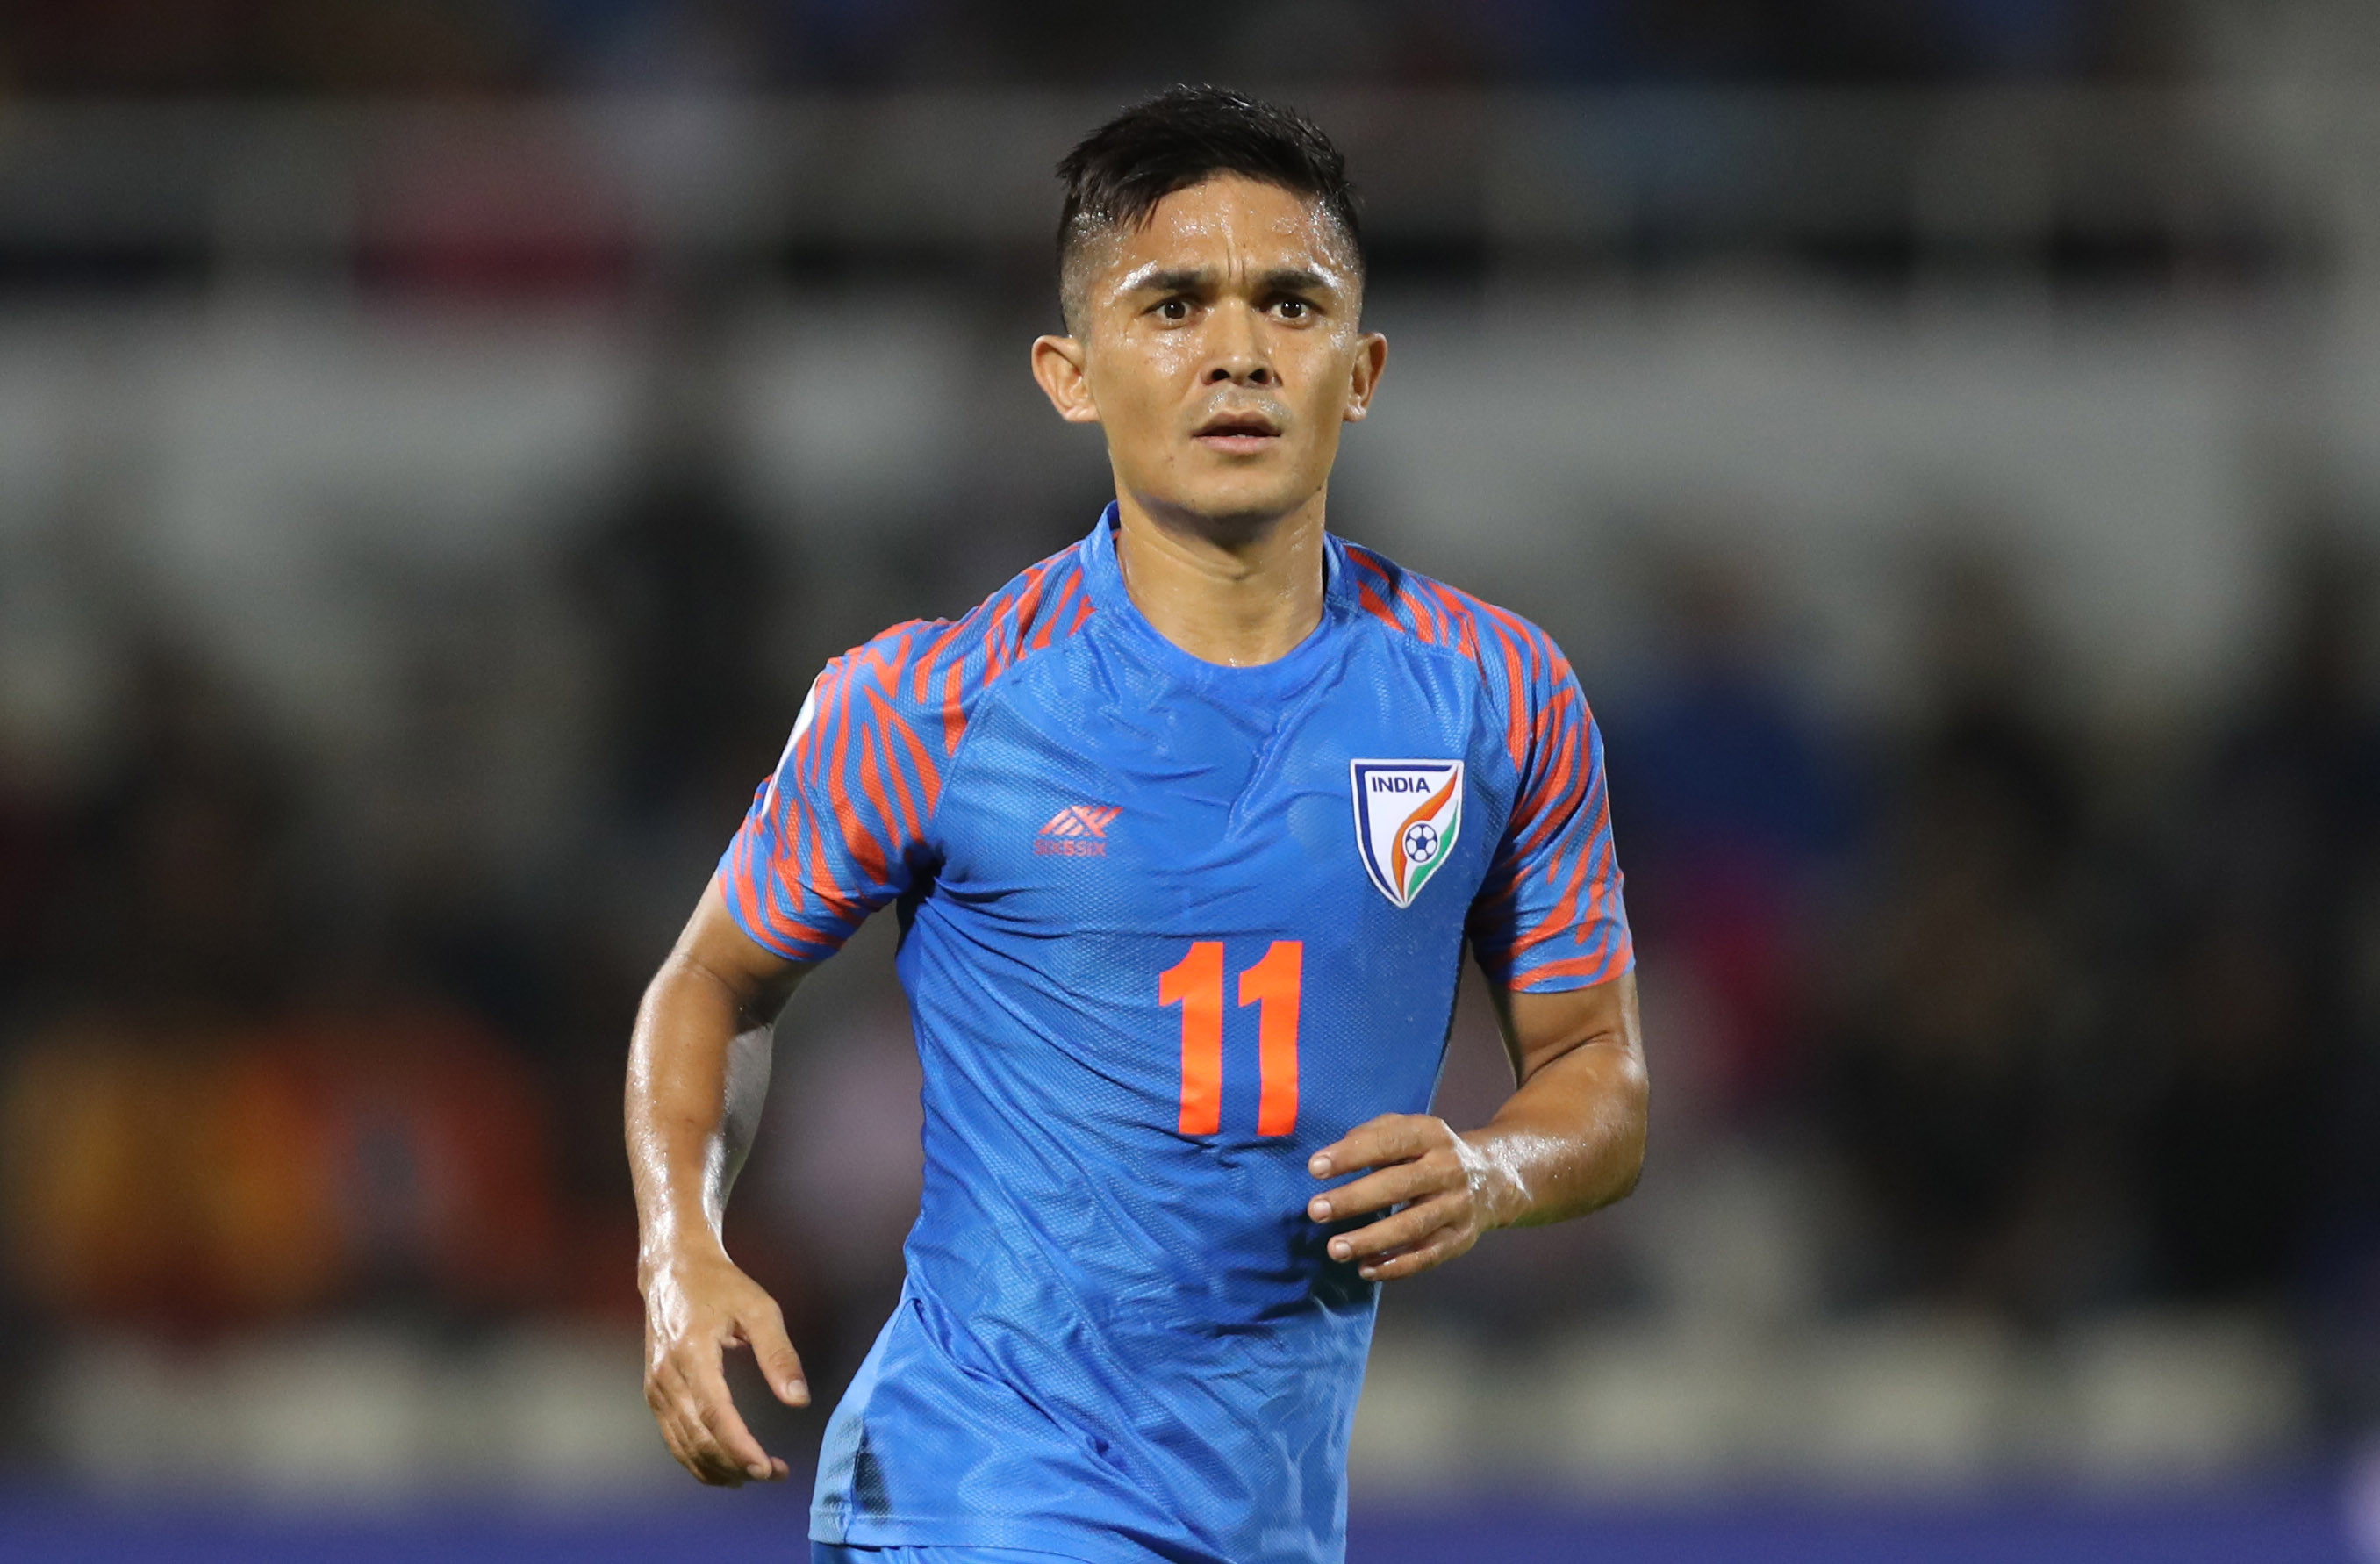 sunil chhetri india bahrain asian cup 2019 plz14m8g6o3v188dw5g15crvy